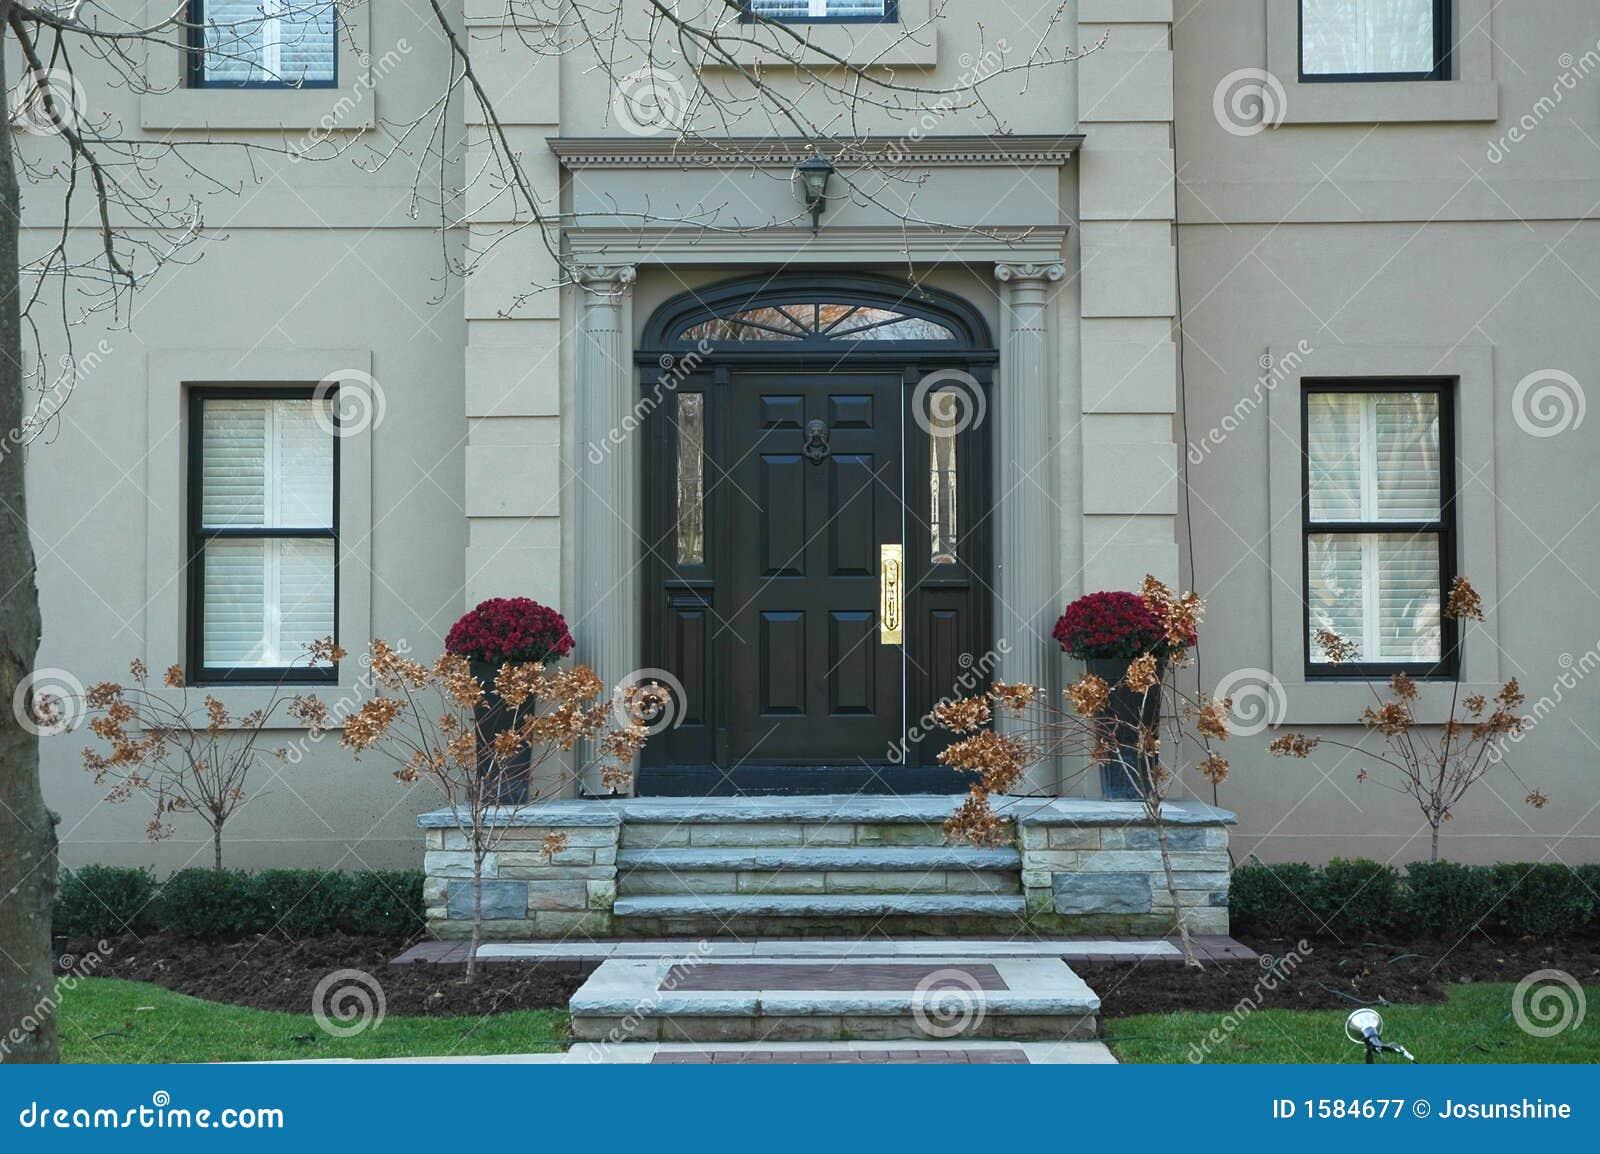 grand-home-entrance-1584677.jpg